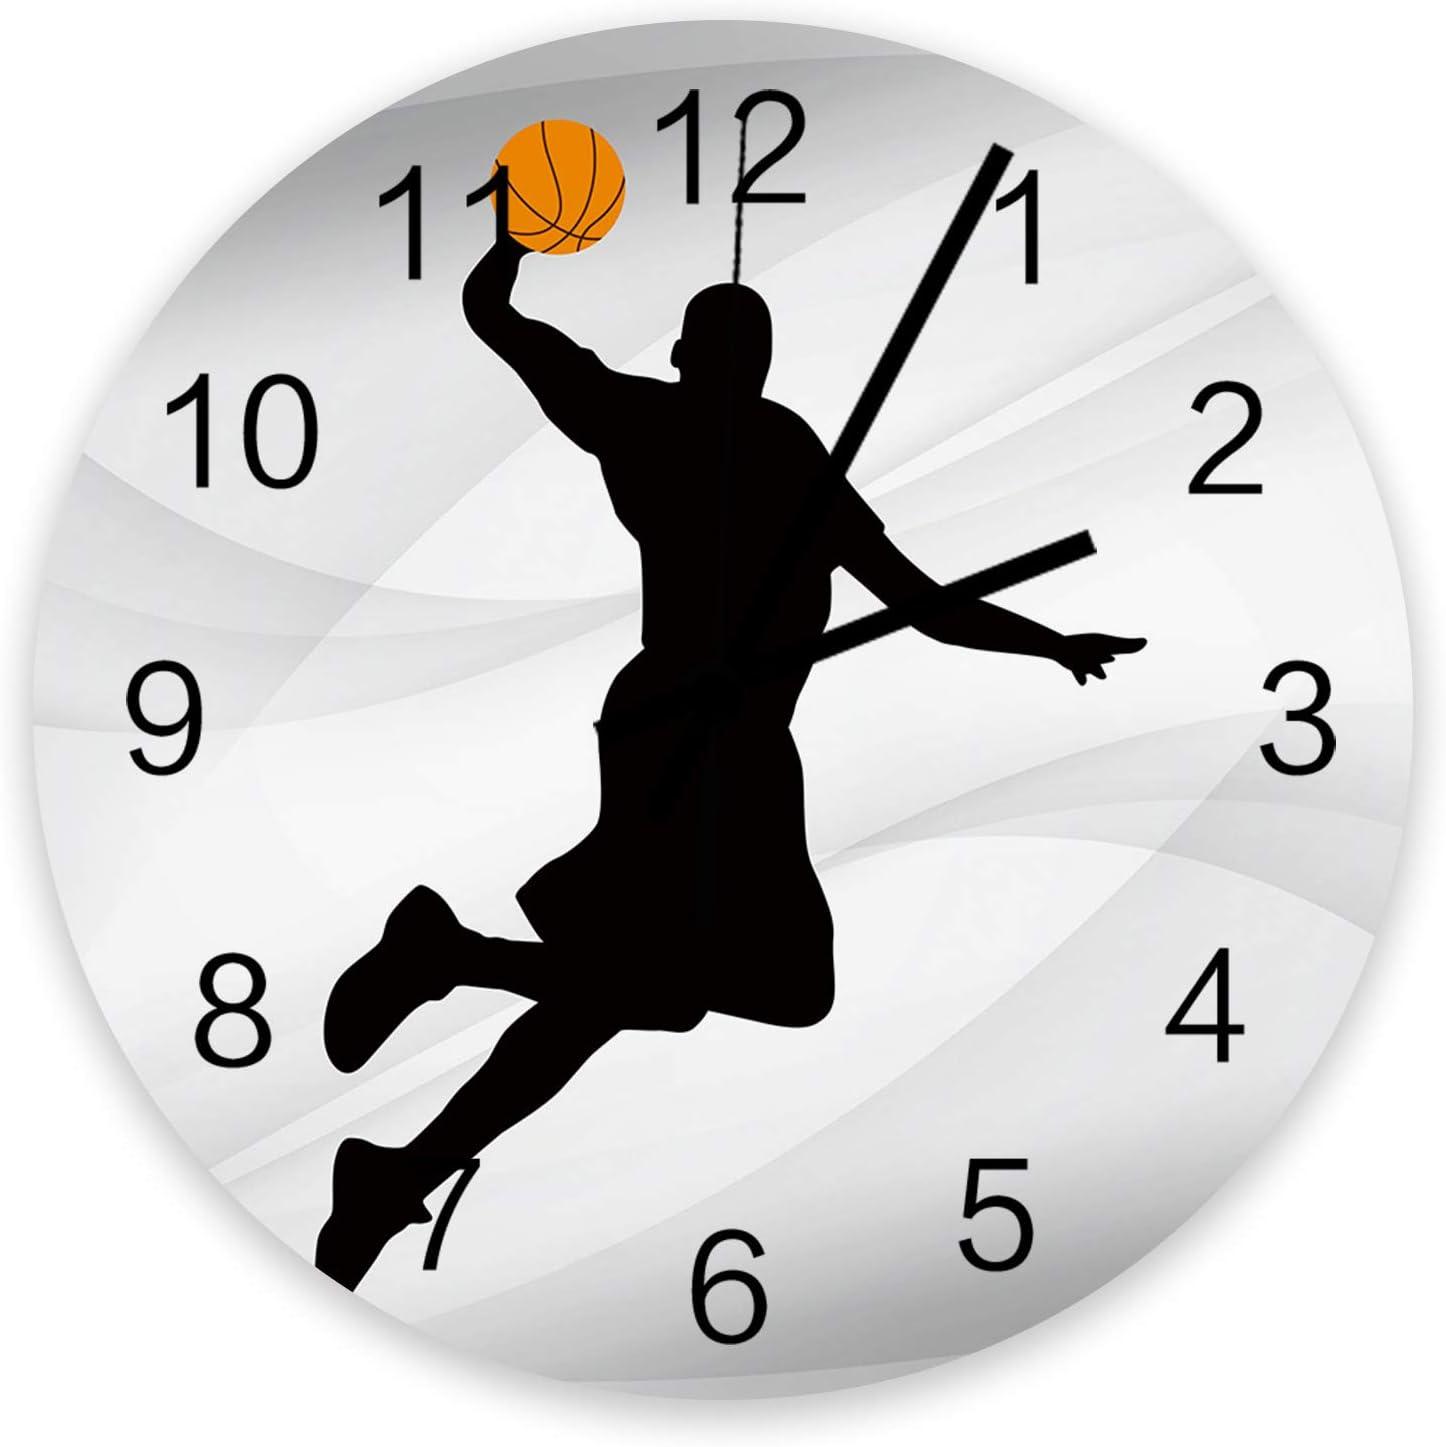 Milwaukee Mall Roses Garden 12 Inch 25% OFF Wooden Basketball Wall Clock Player Silhou